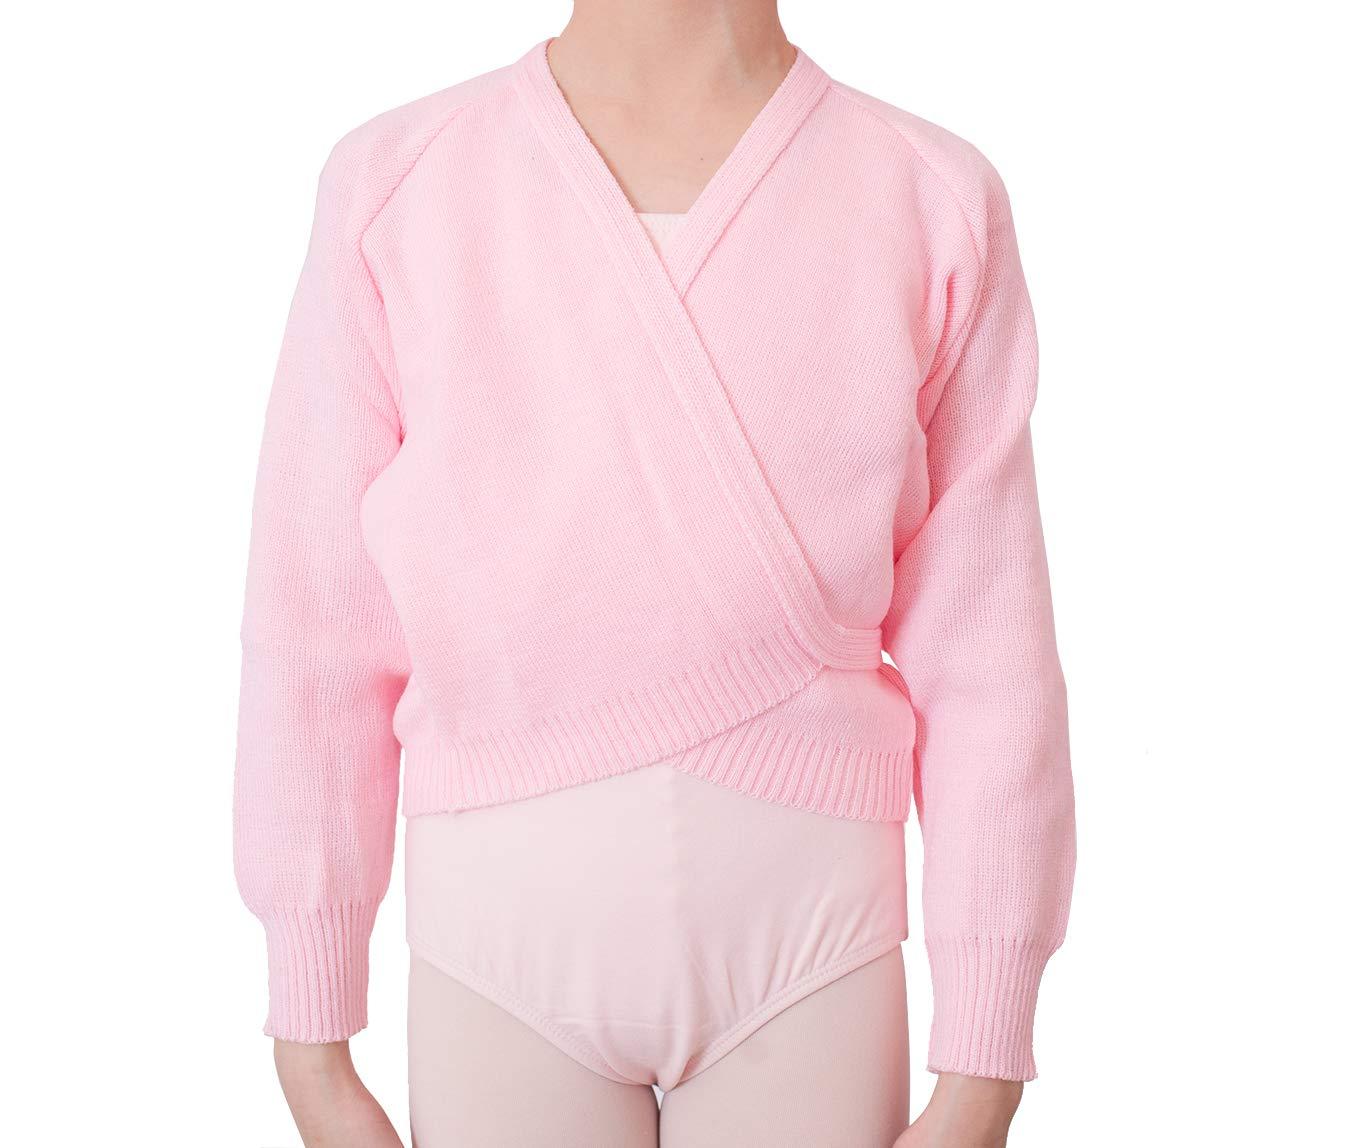 DANCEYOU Girls' Ballet Knit Wrap Sweater Dance Cardigan Long Sleeve Tops Self Tie